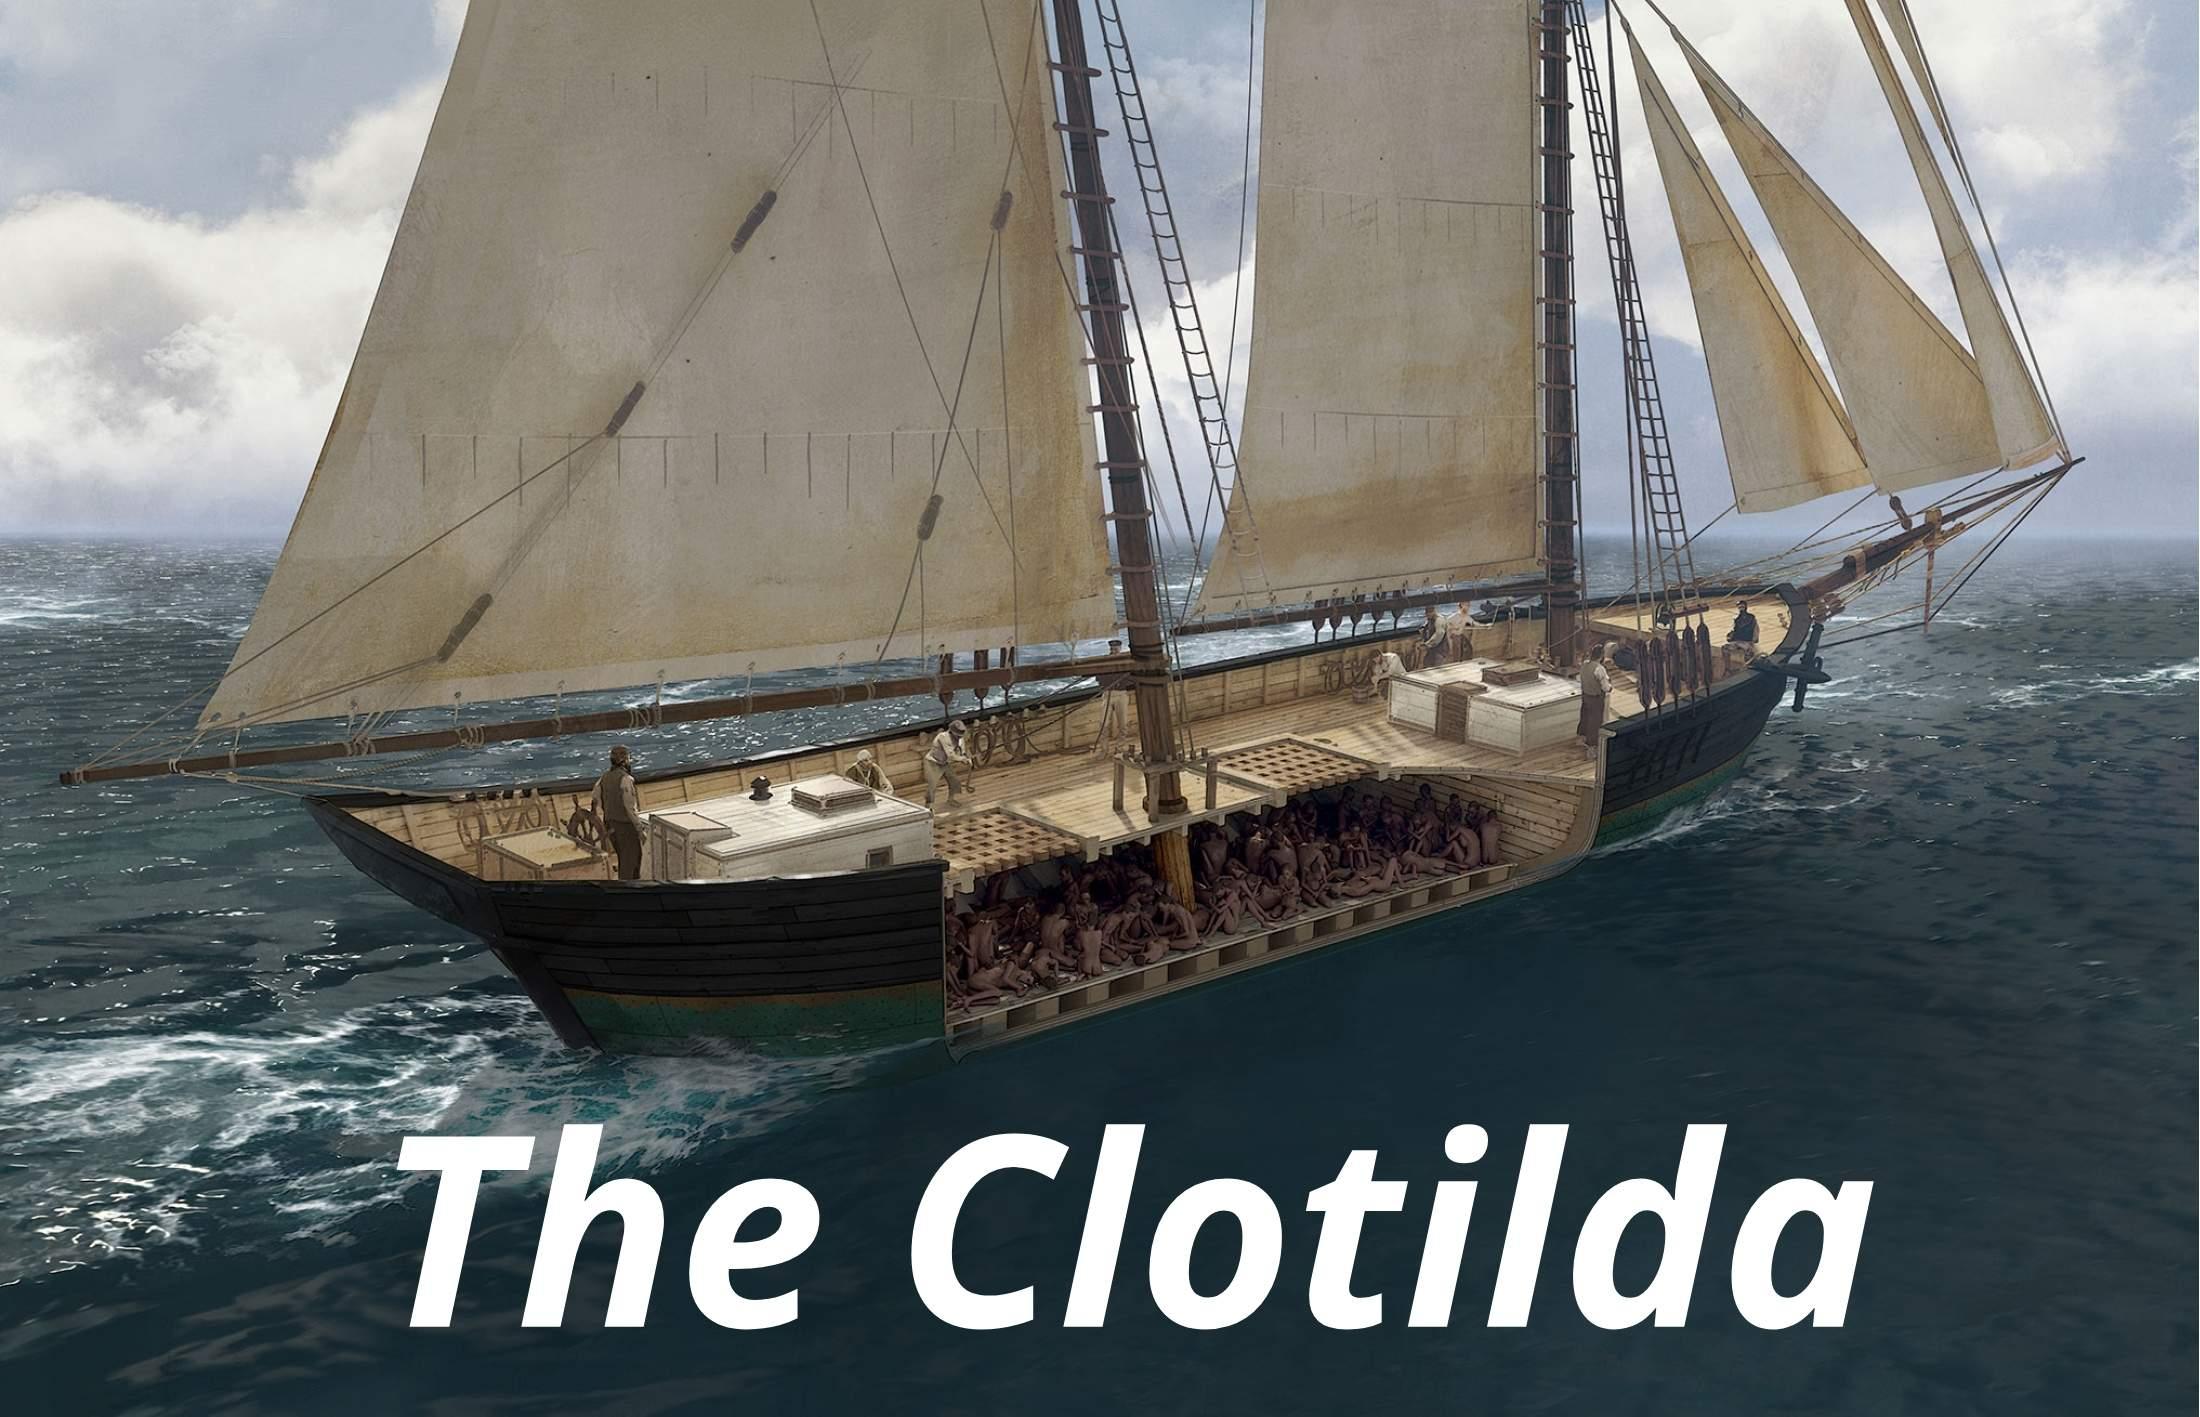 The Clotilda